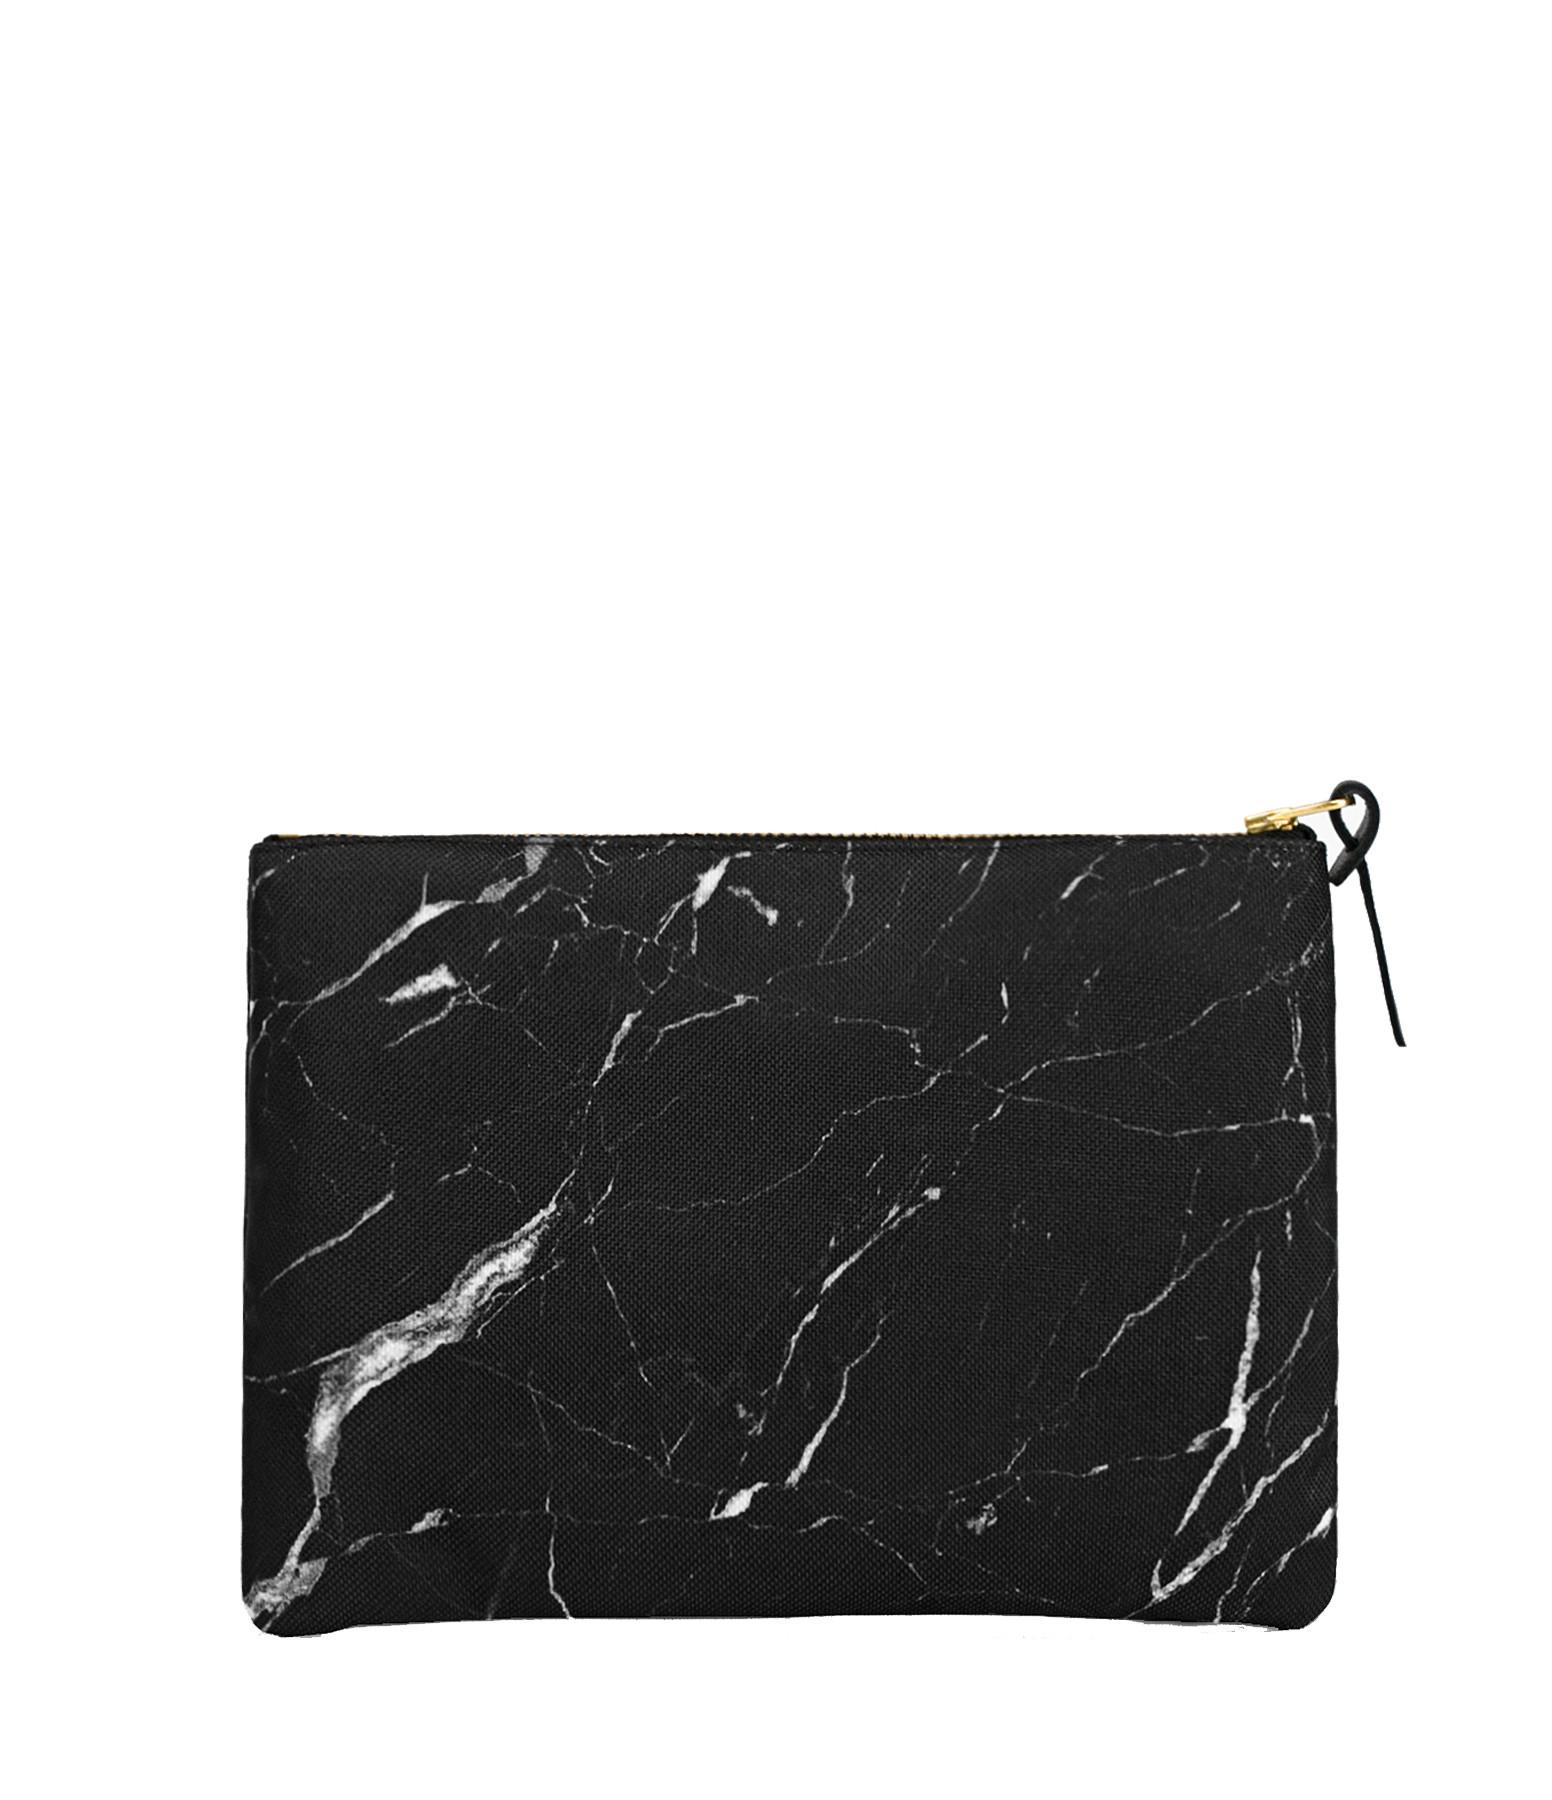 WOUF - Trousse L Black Marble